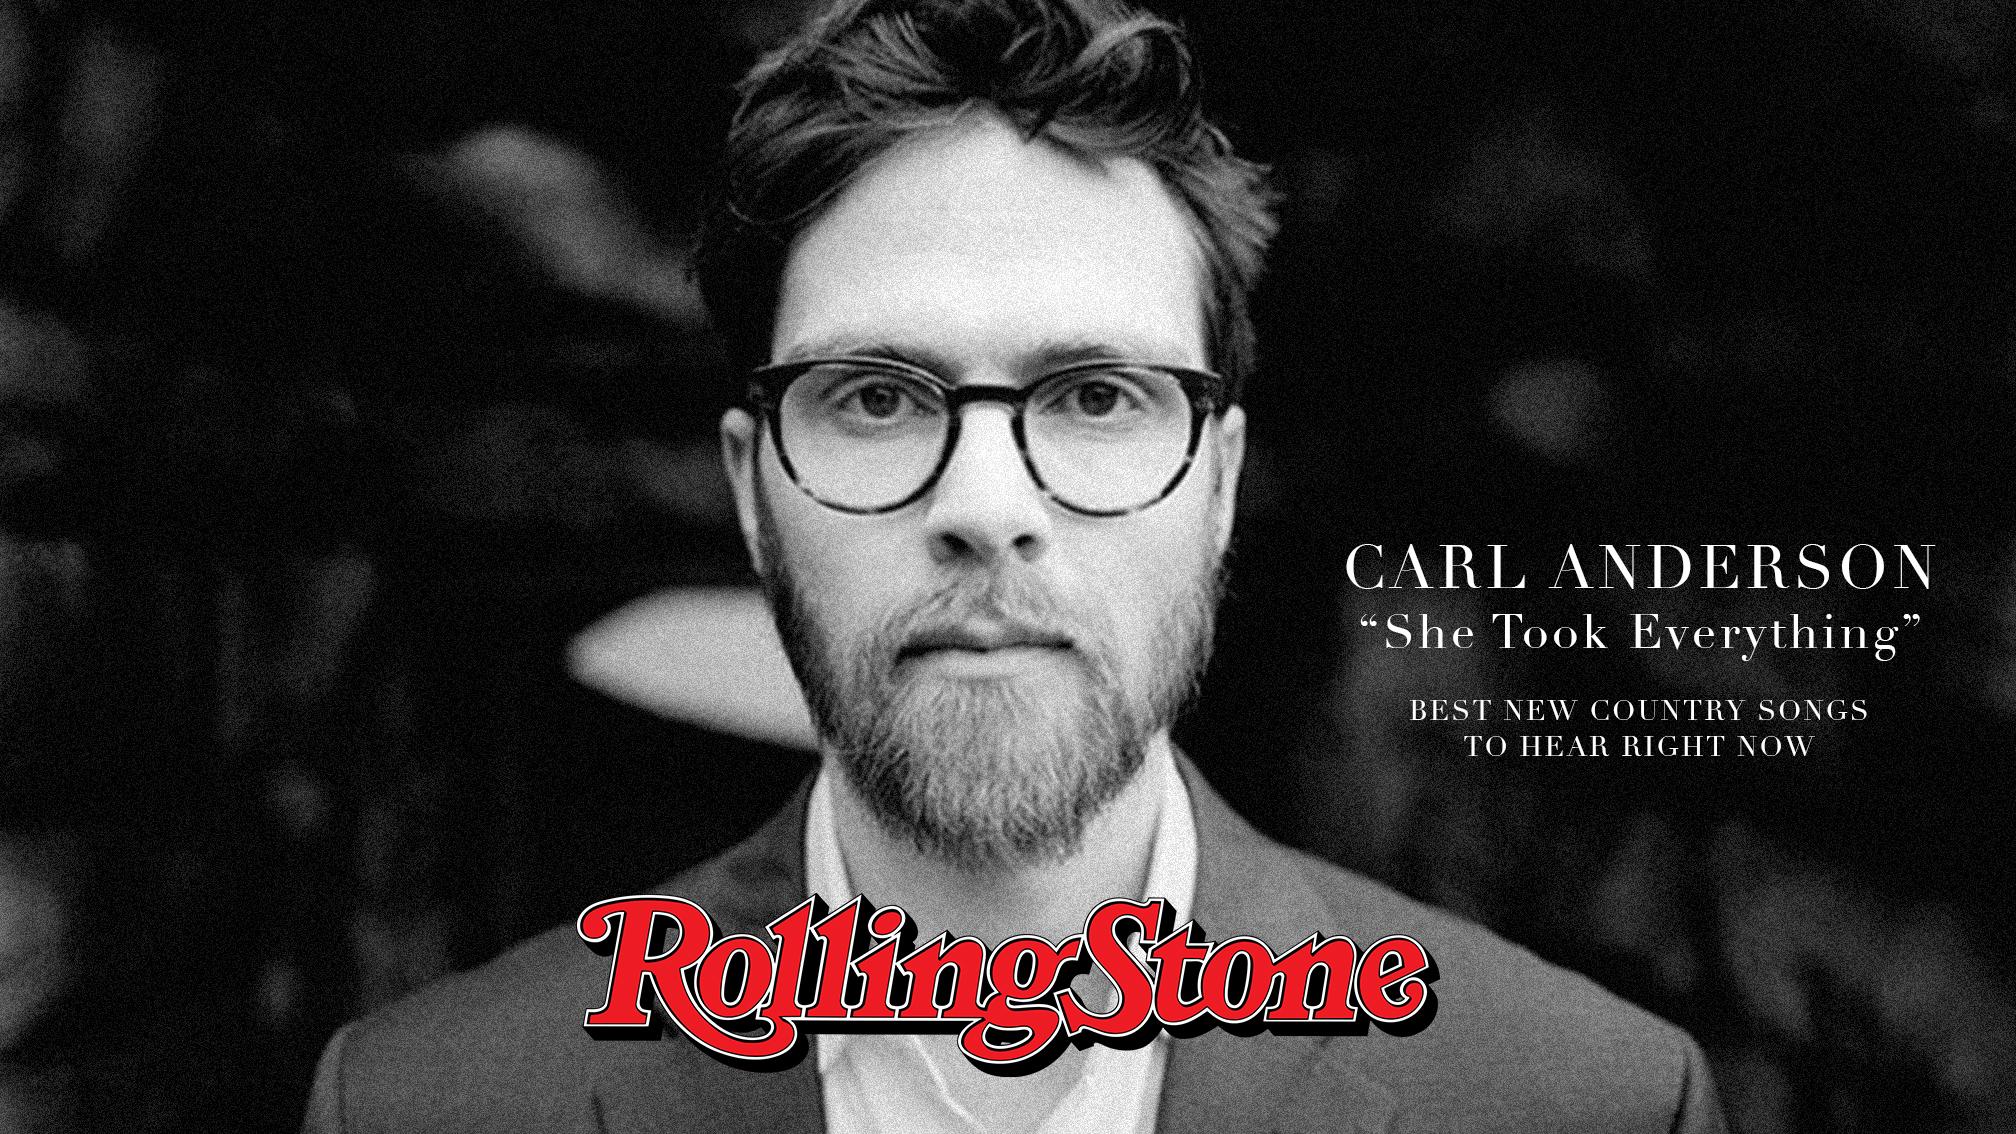 CarlAnderson_RollingStoneBanner2.jpg